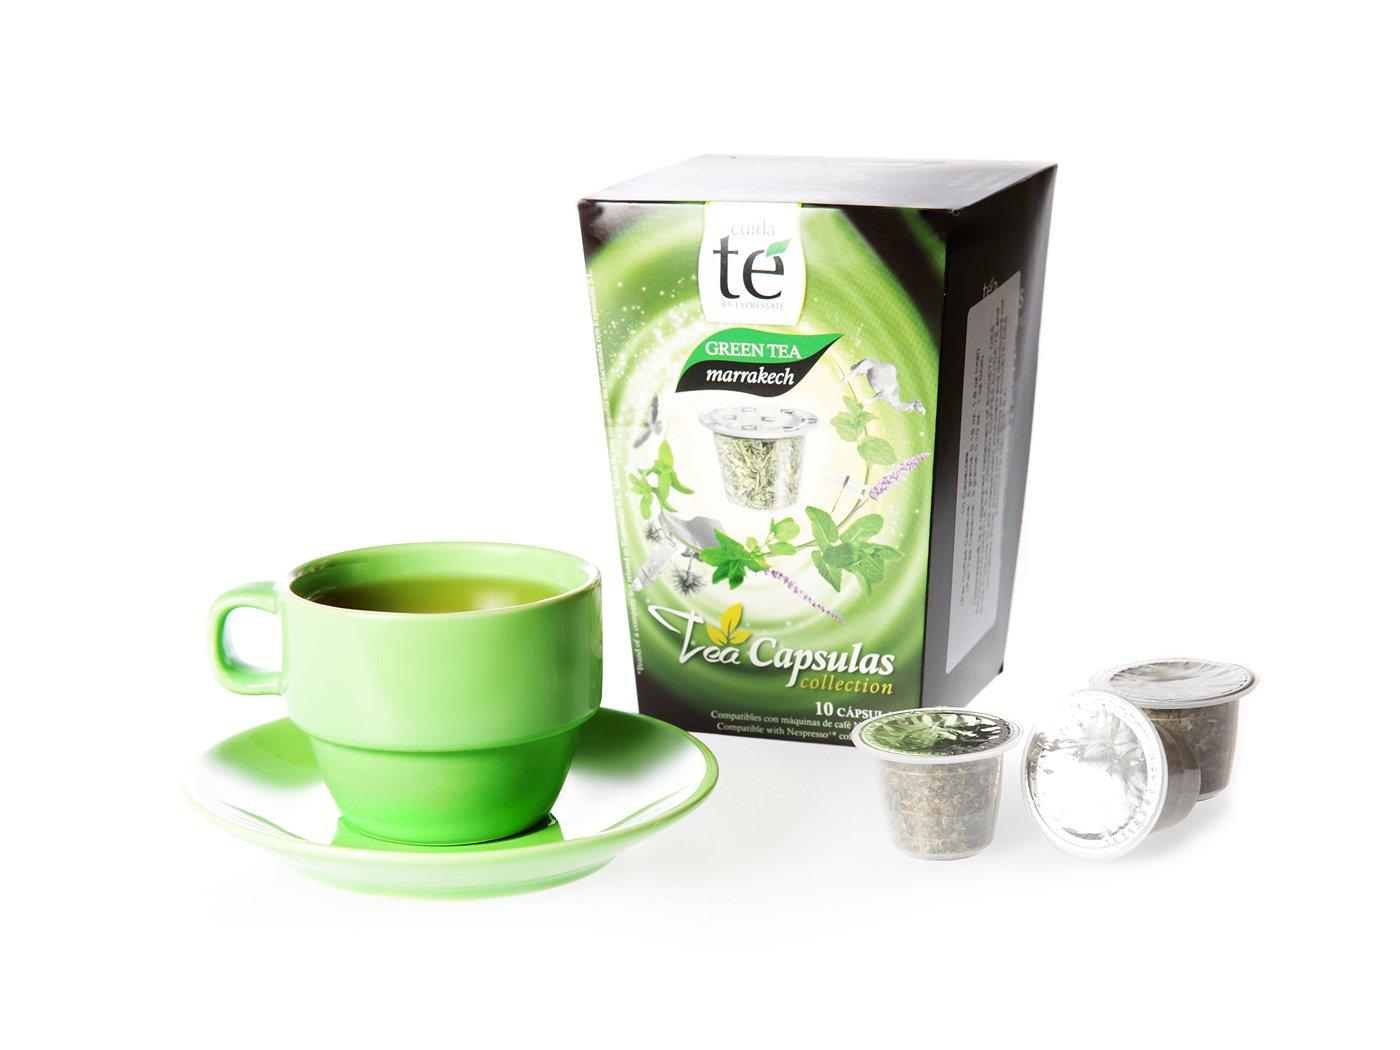 20 Nespresso Compatible Tea Pods - Marrakech Green Tea, 2 Boxes - 10 Pods / Box: Amazon.com: Grocery & Gourmet Food